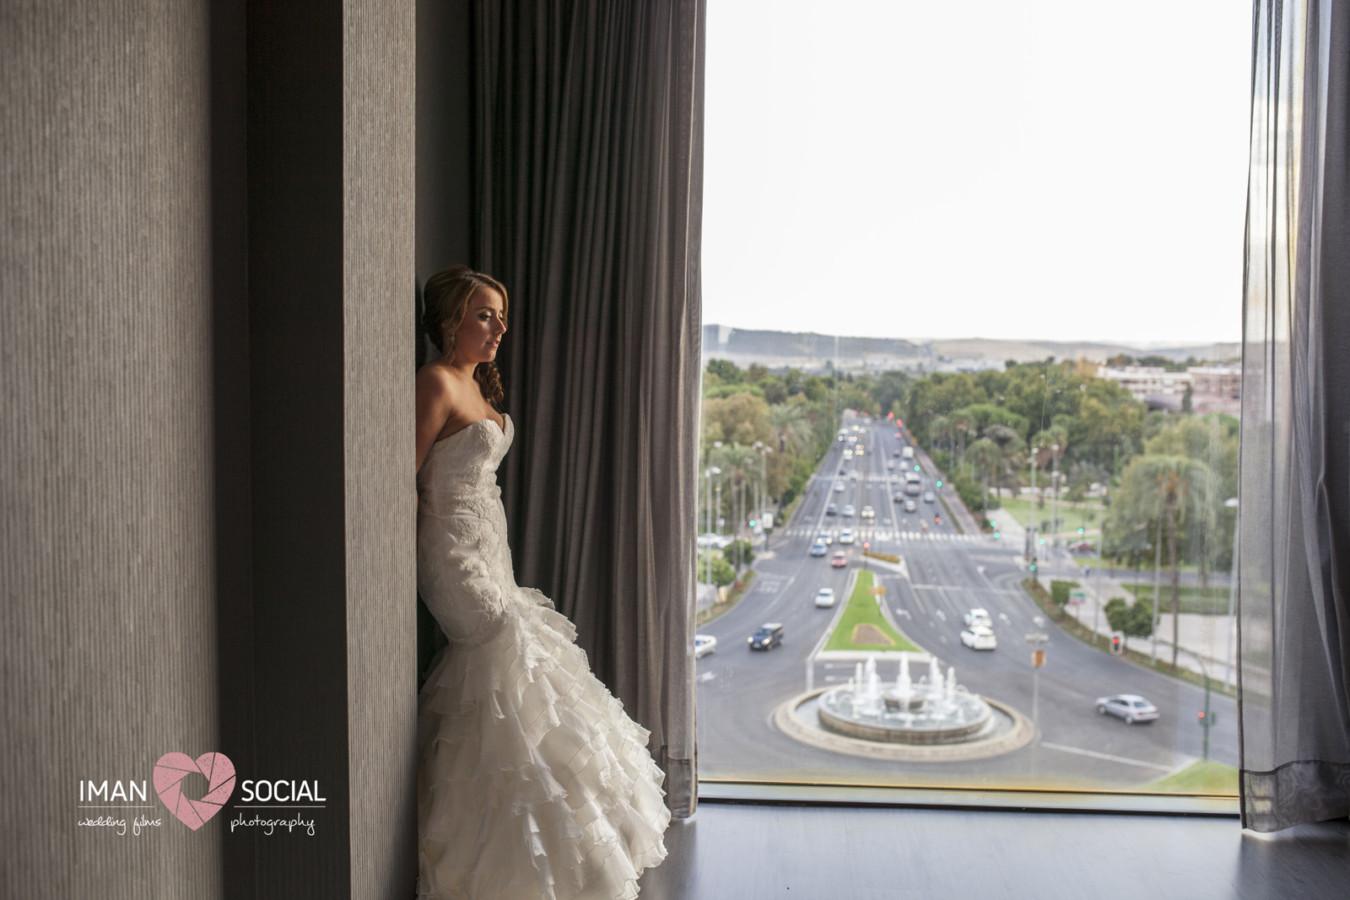 MG_7802 Juan Antonio y Mónica - video boda cordoba